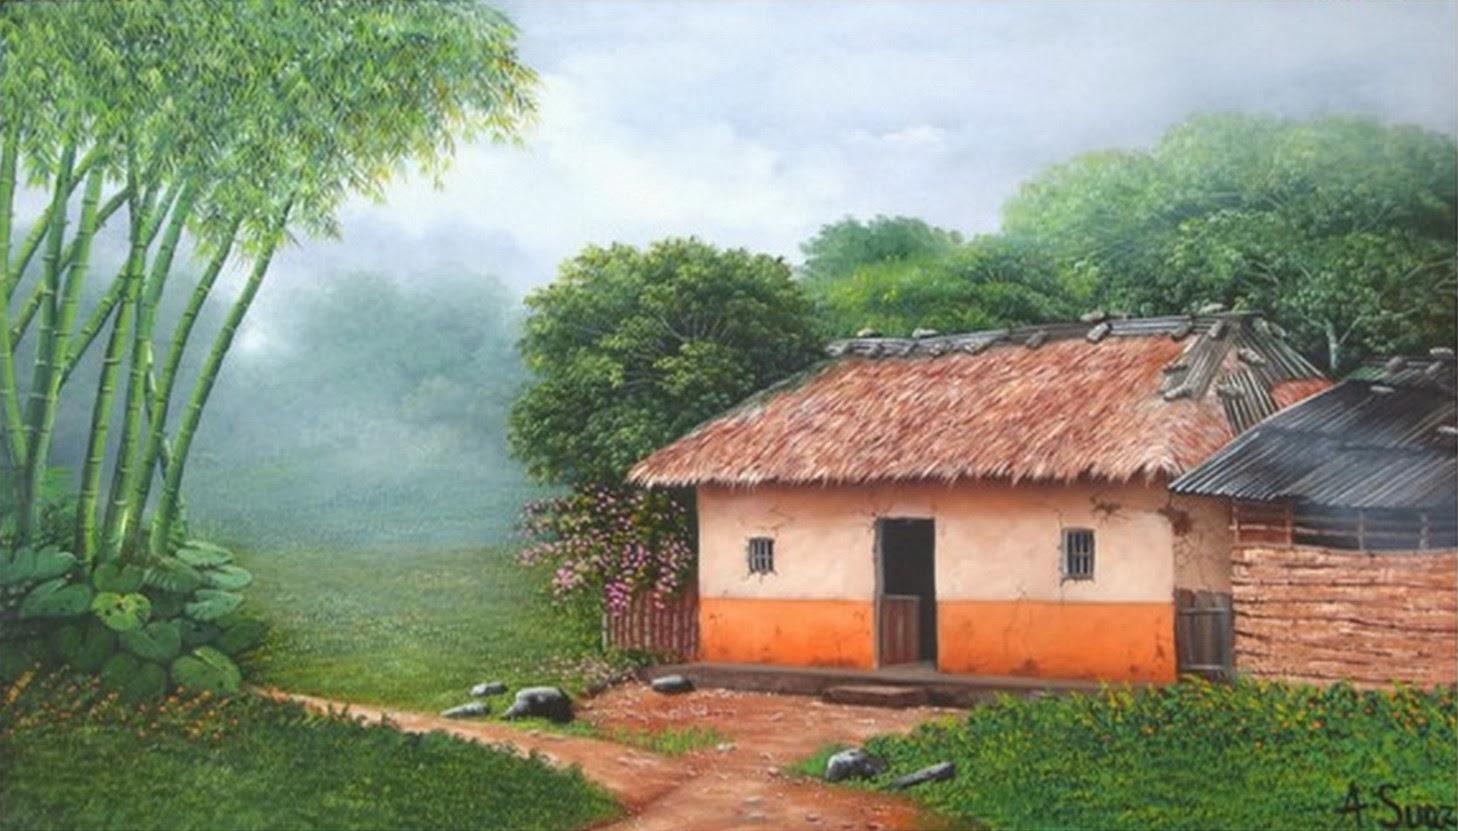 Pintura moderna y fotograf a art stica paisajes - Cuadros para pintar en casa ...